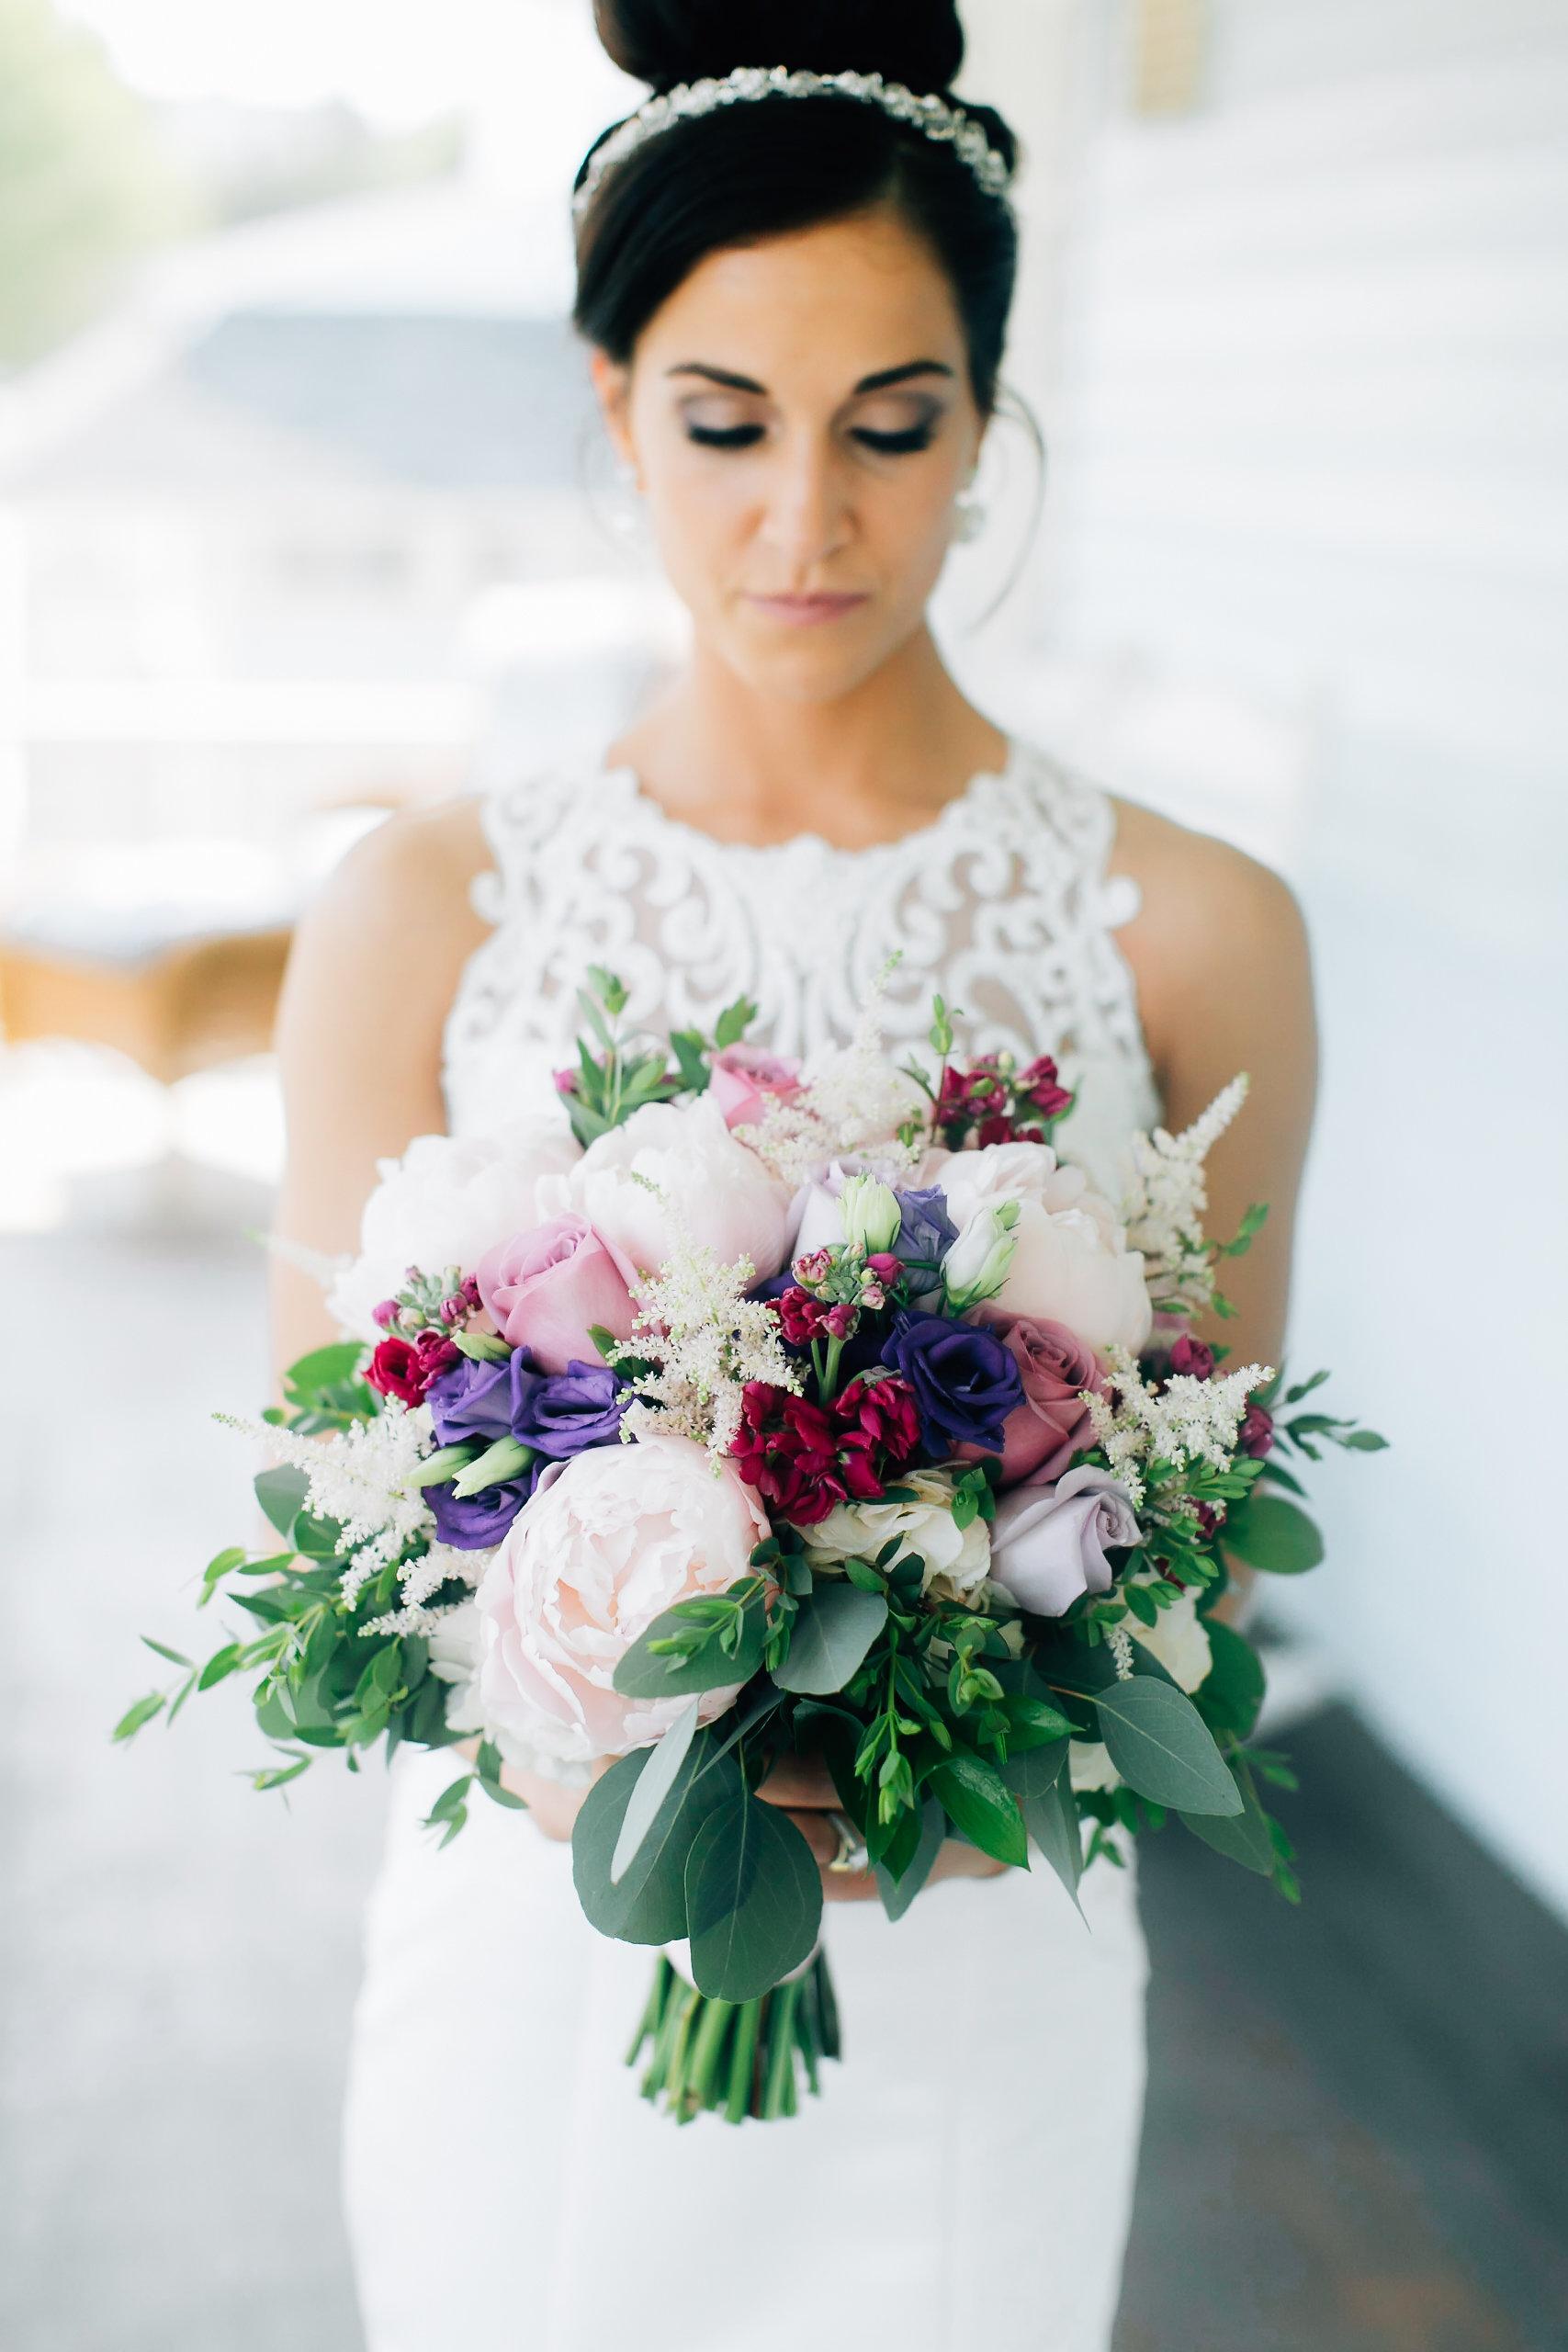 MagdalenaStudios_WeddingPhotographer_WillowCreekWinery_CarissaJoe-216.jpg